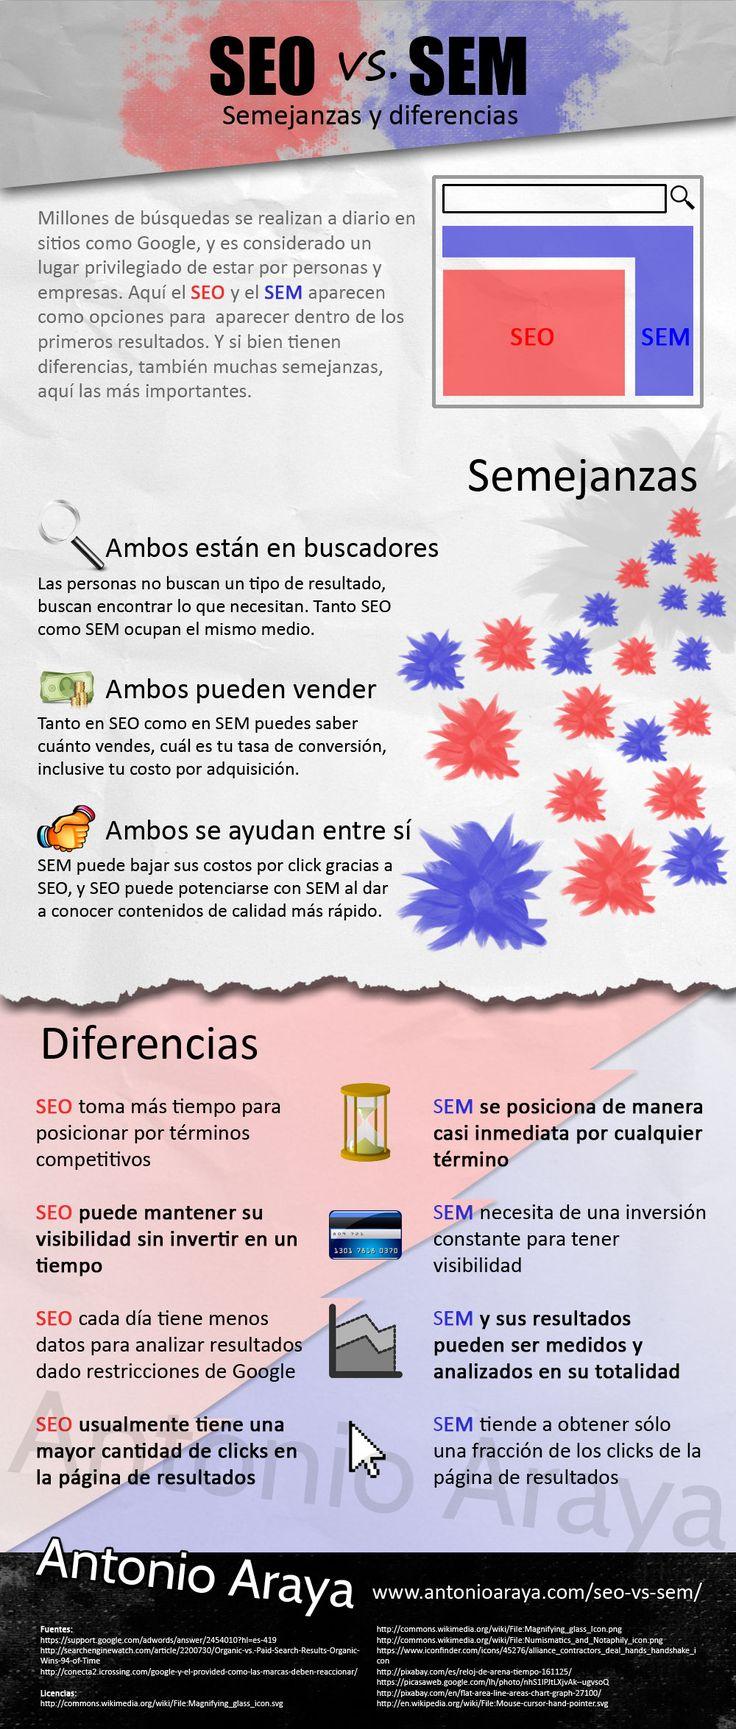 SEO vs SEM: semejanzas y diferencias #infografia #infographic #seo #marketing